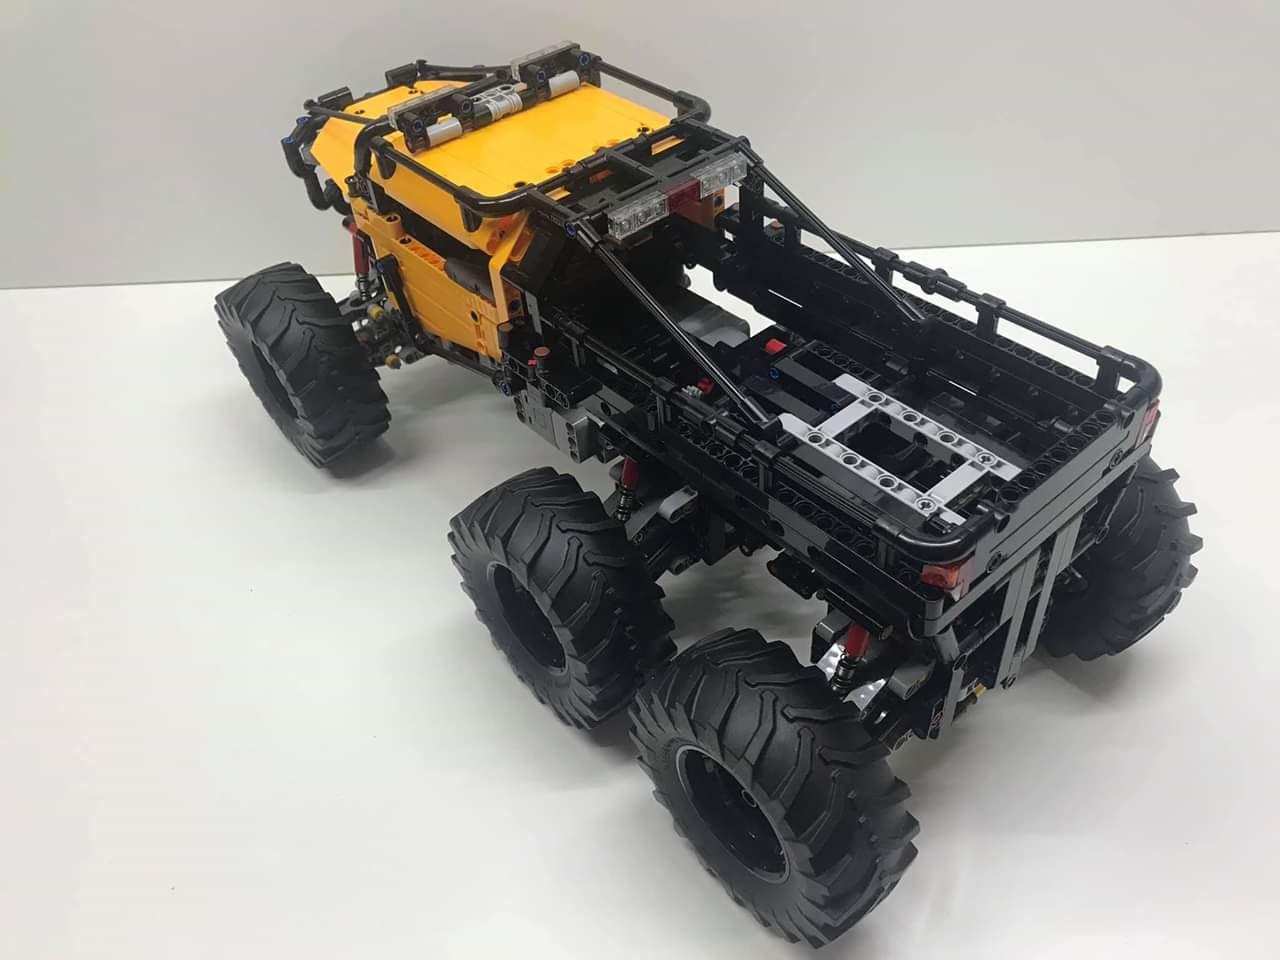 Lego Technic 42099 Moc 6x6 X Treme Off Roader Lego Technic Lego Lego Construction